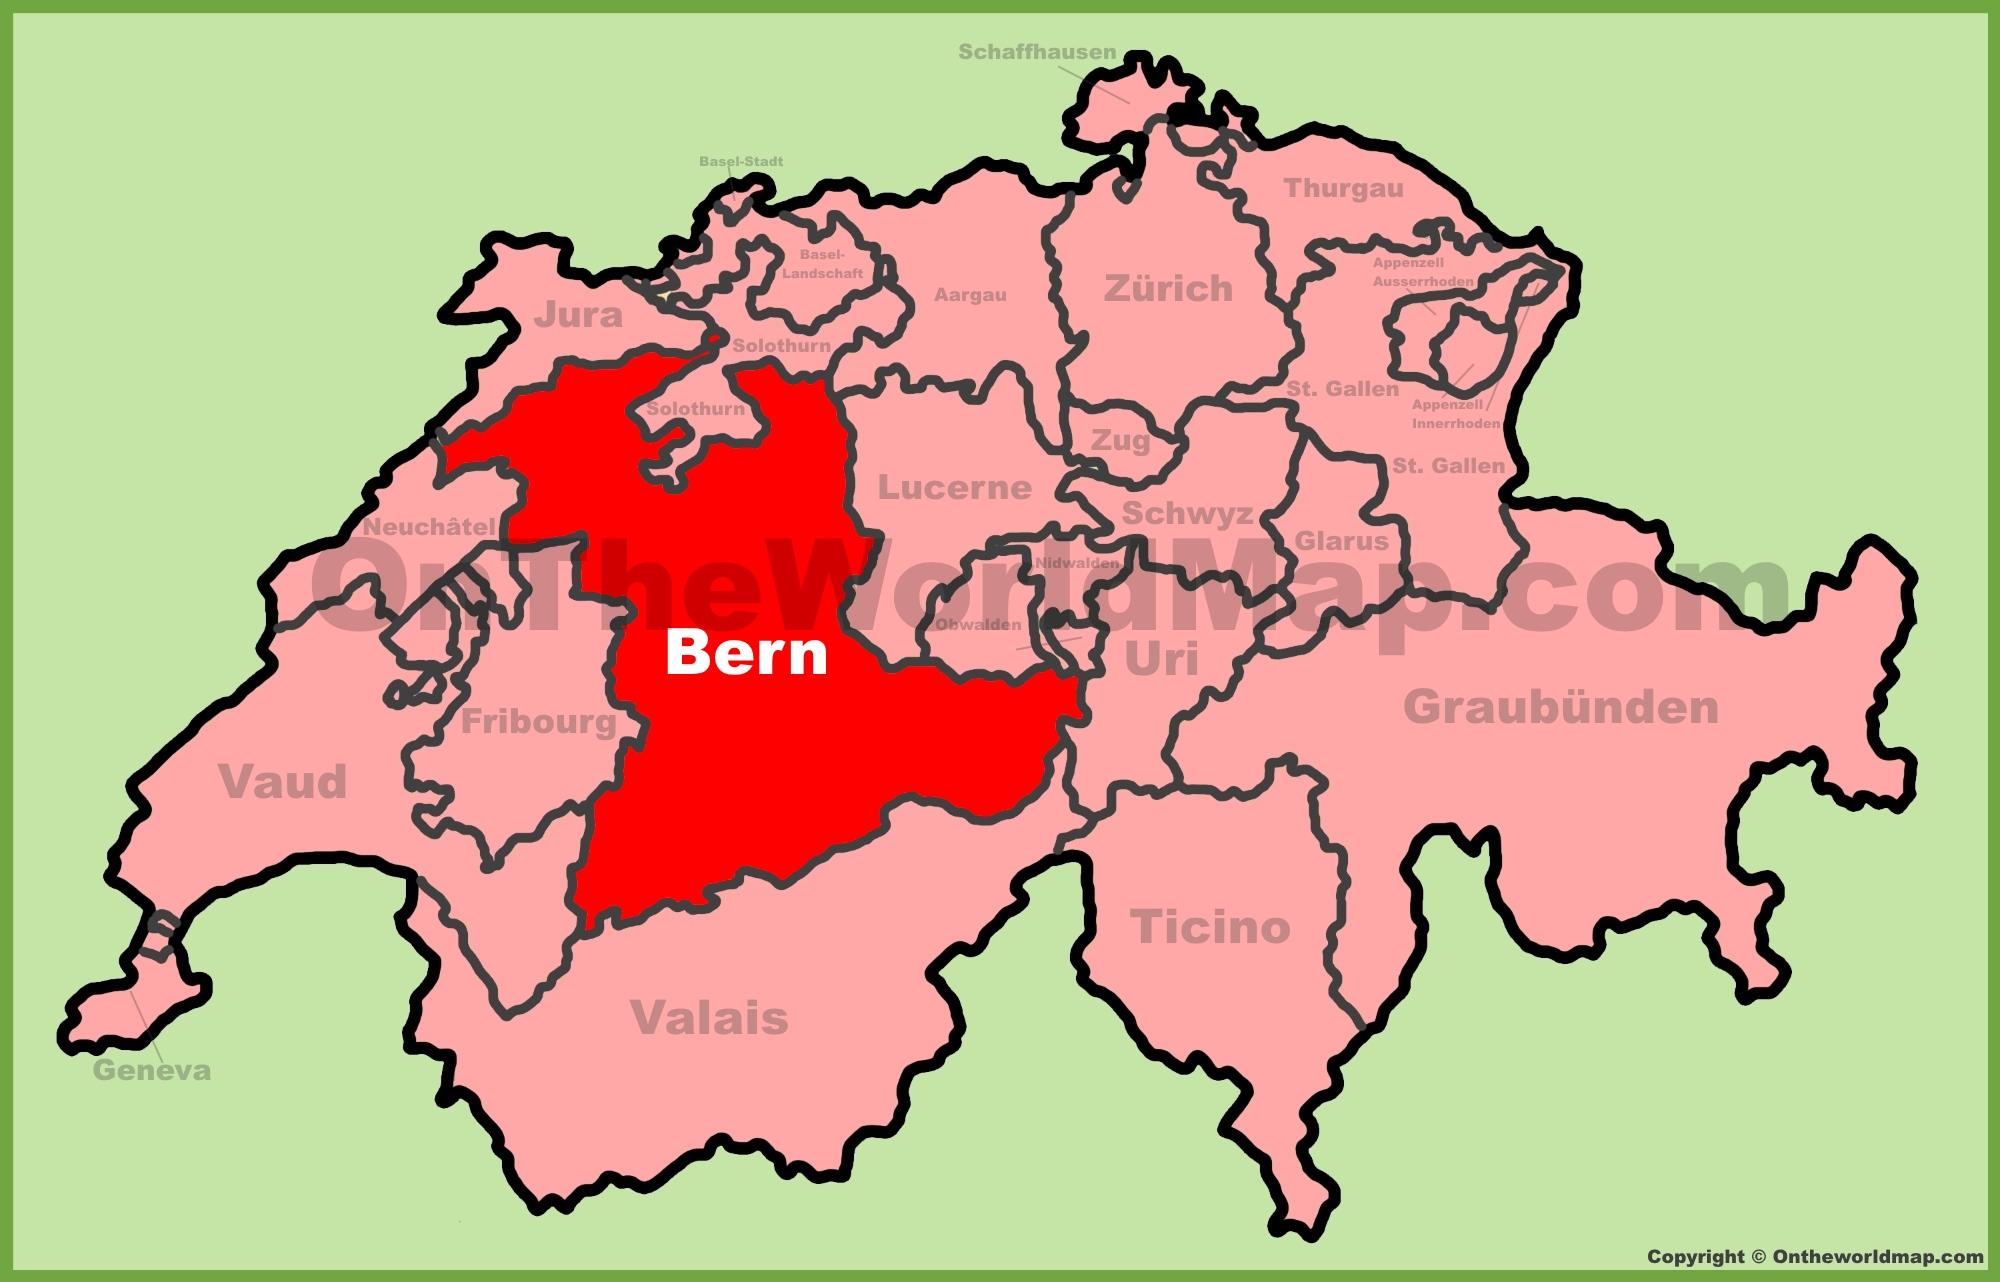 Bern Switzerland Map Canton of Bern Maps | Switzerland | Maps of Canton of Bern Bern Switzerland Map